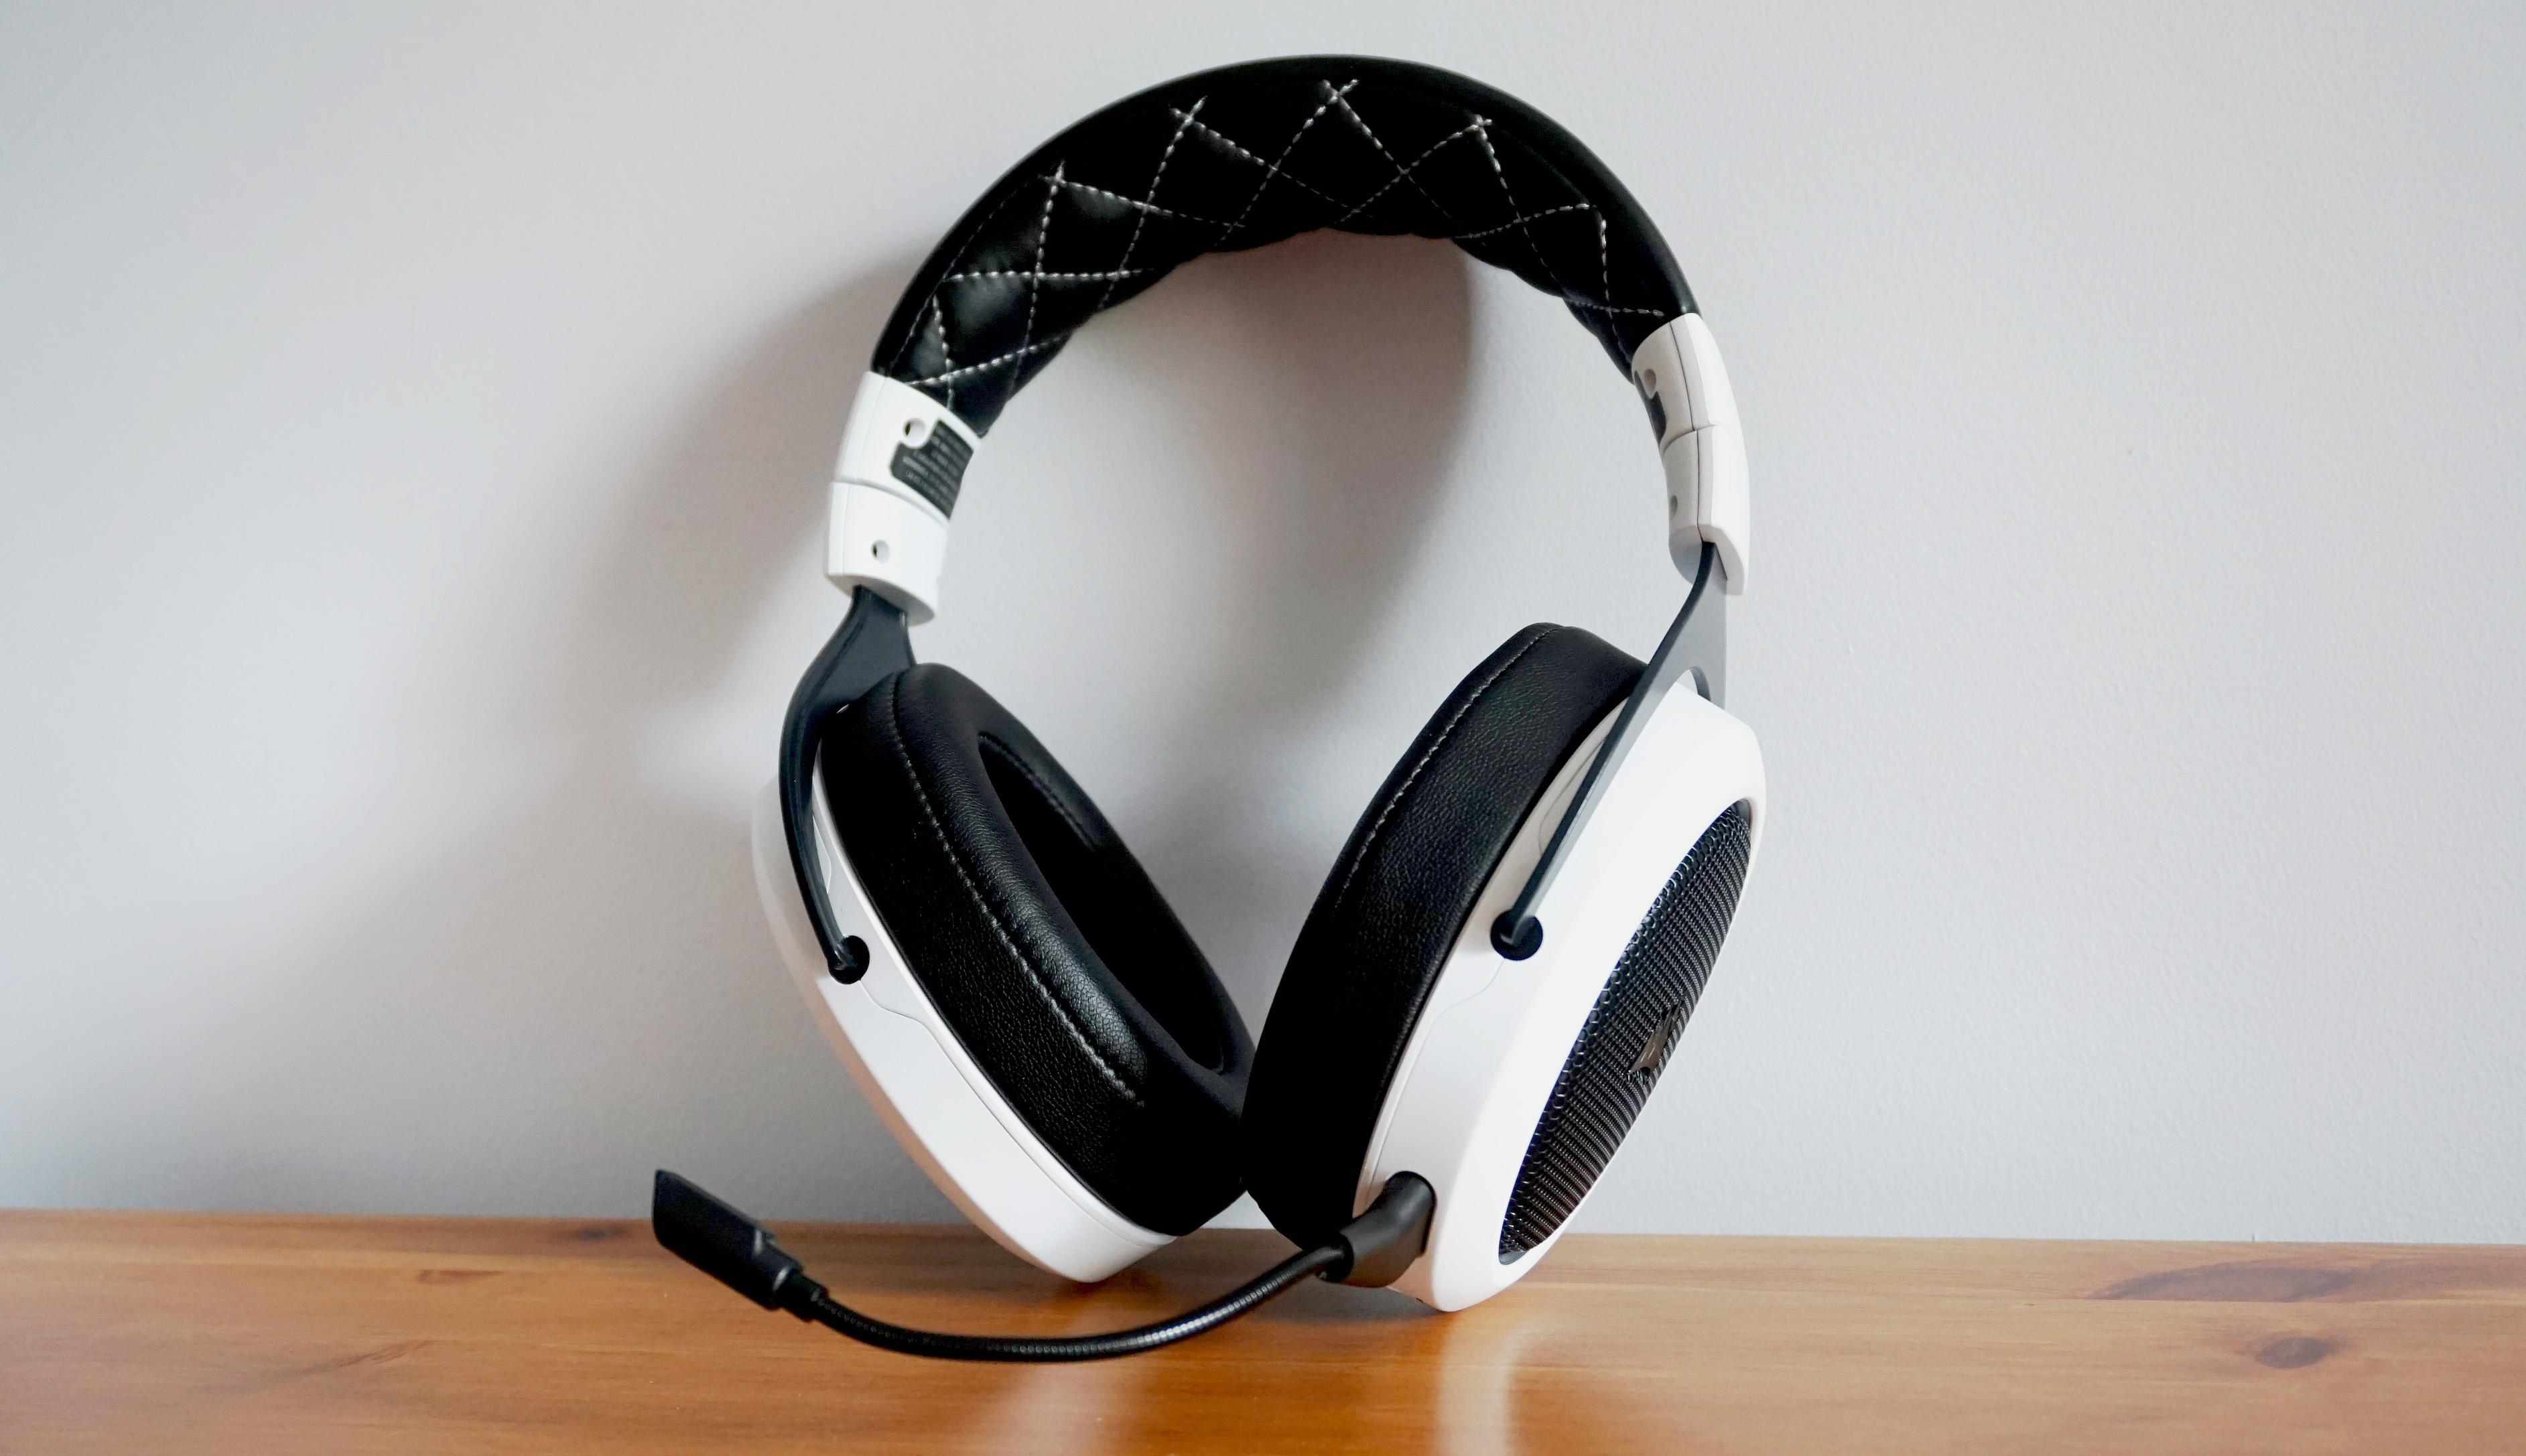 ergonomic chair joe rogan black leather accent chairs experience podcast equipment amp studio setup calvin